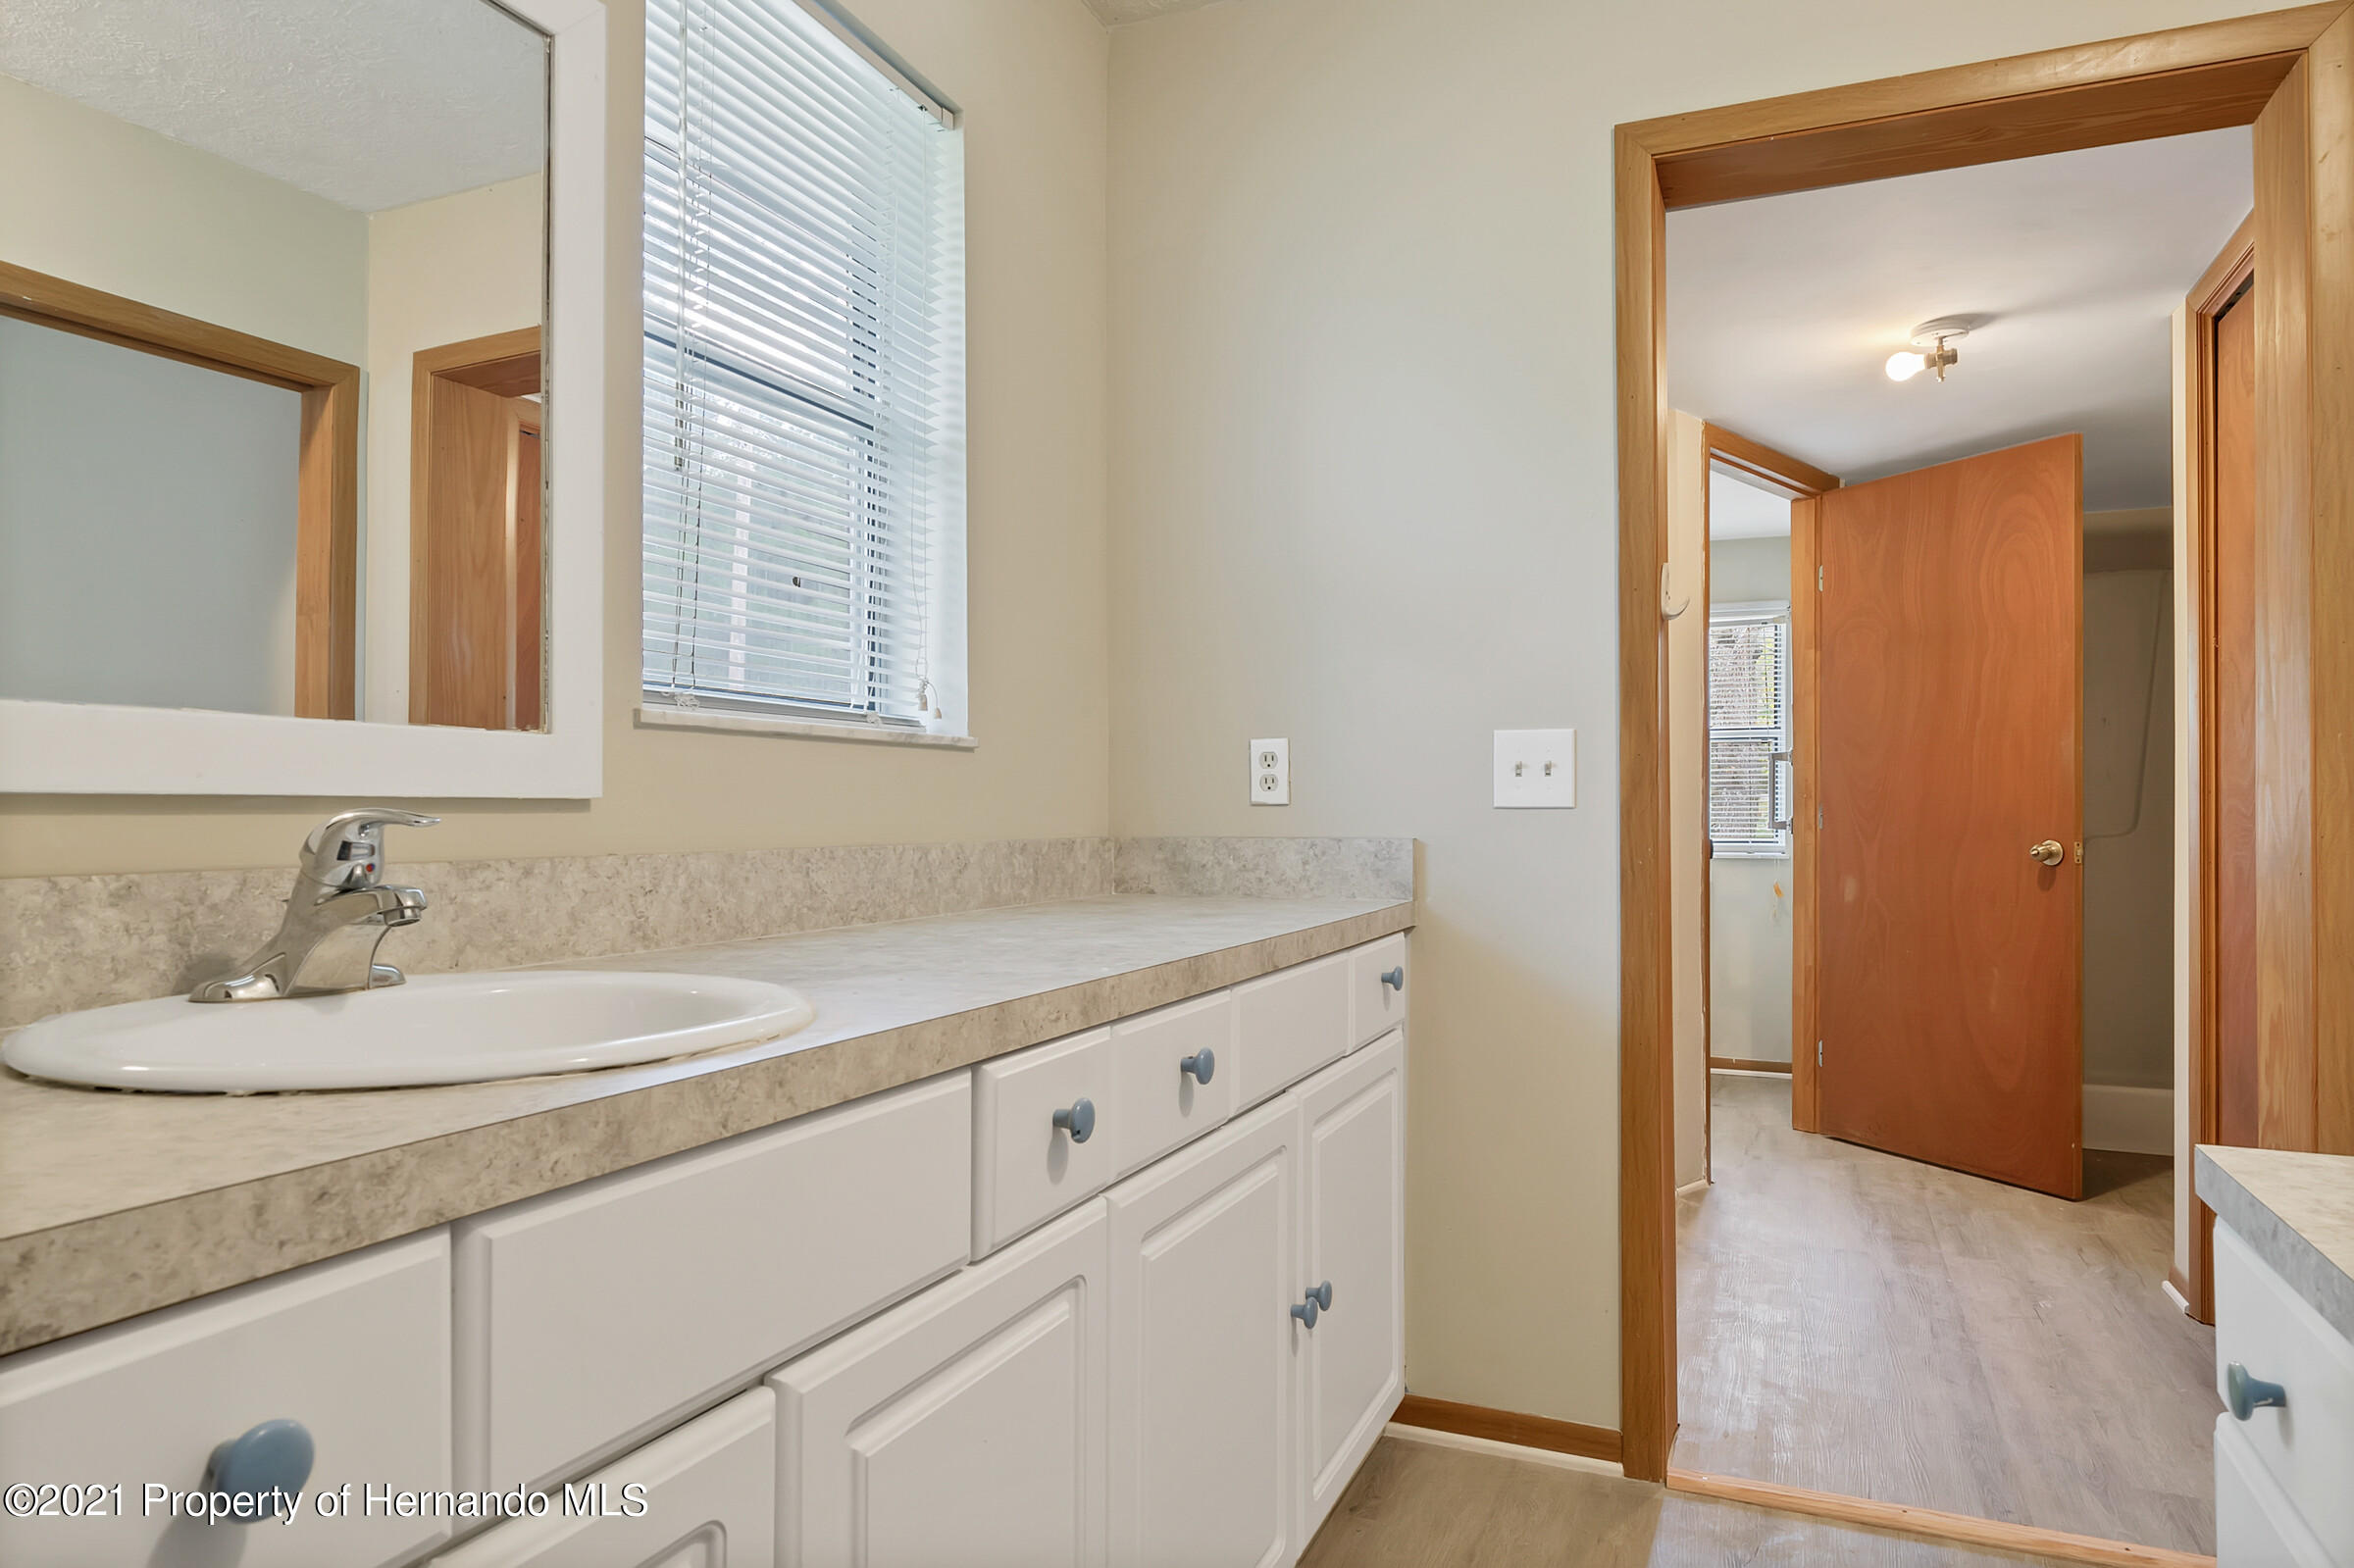 Lisitng Image number7 for 4708 S. Evergreen Avenue